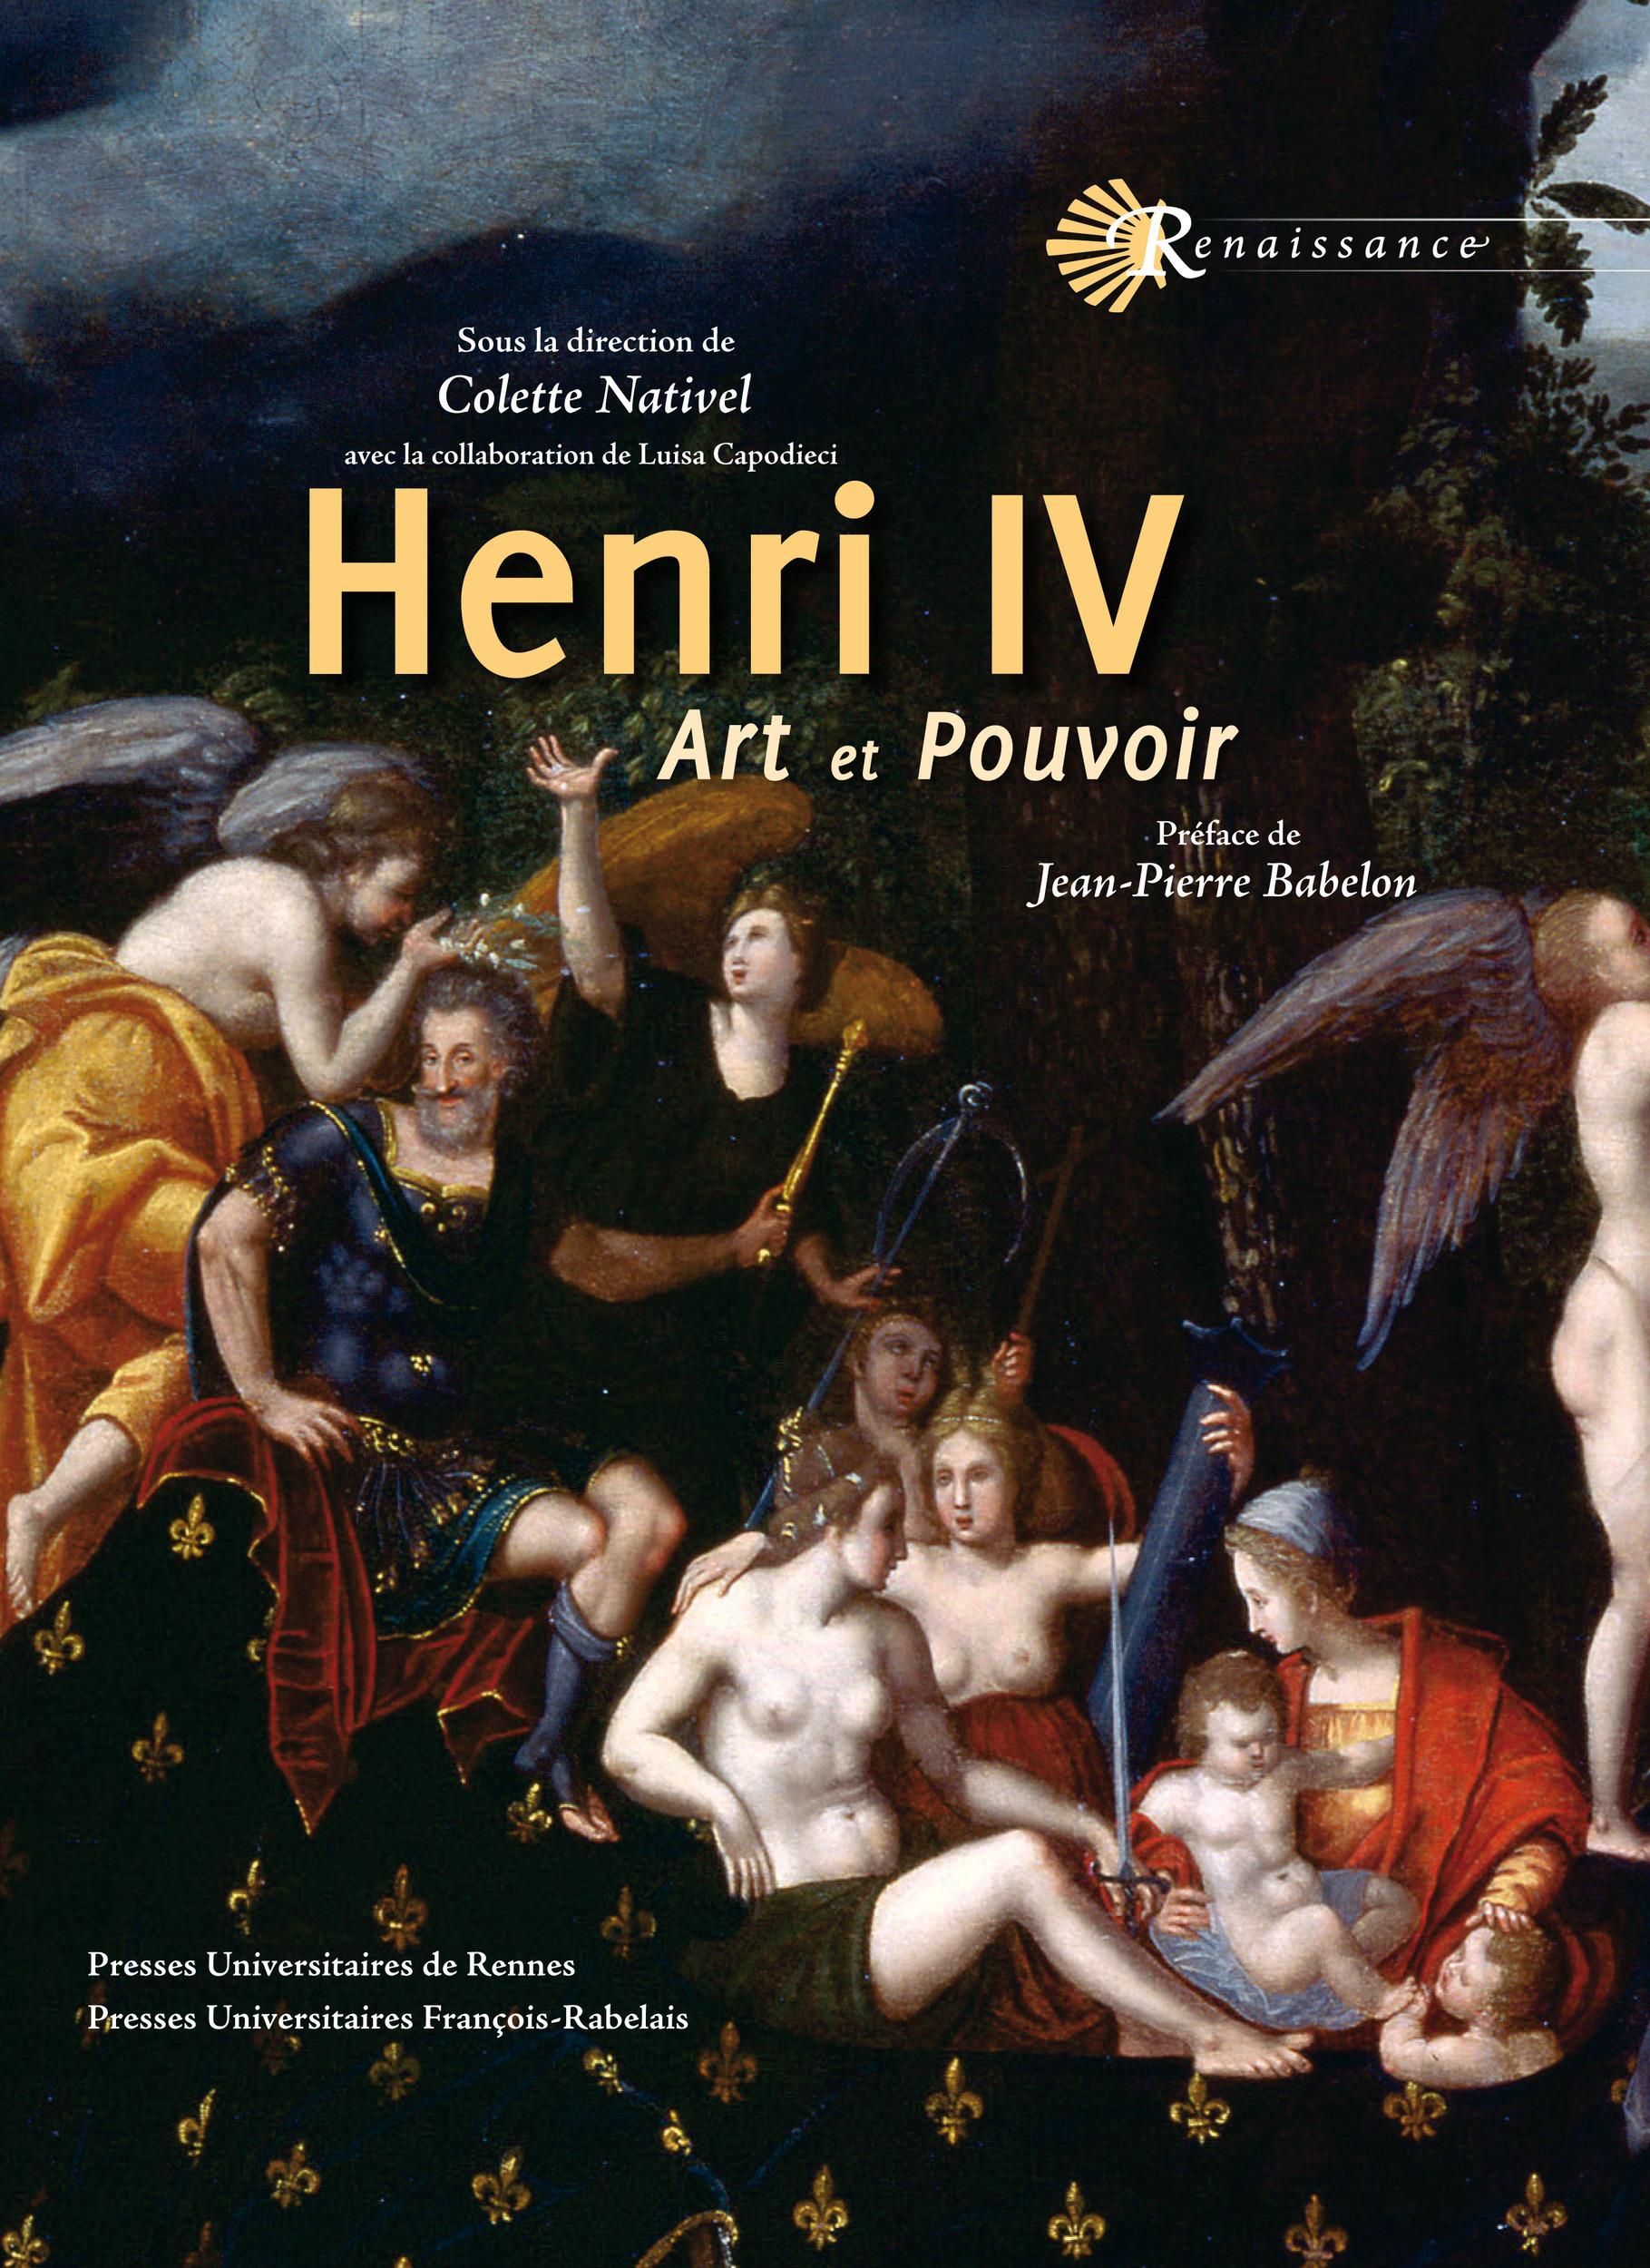 henri iv - art et pouvoir